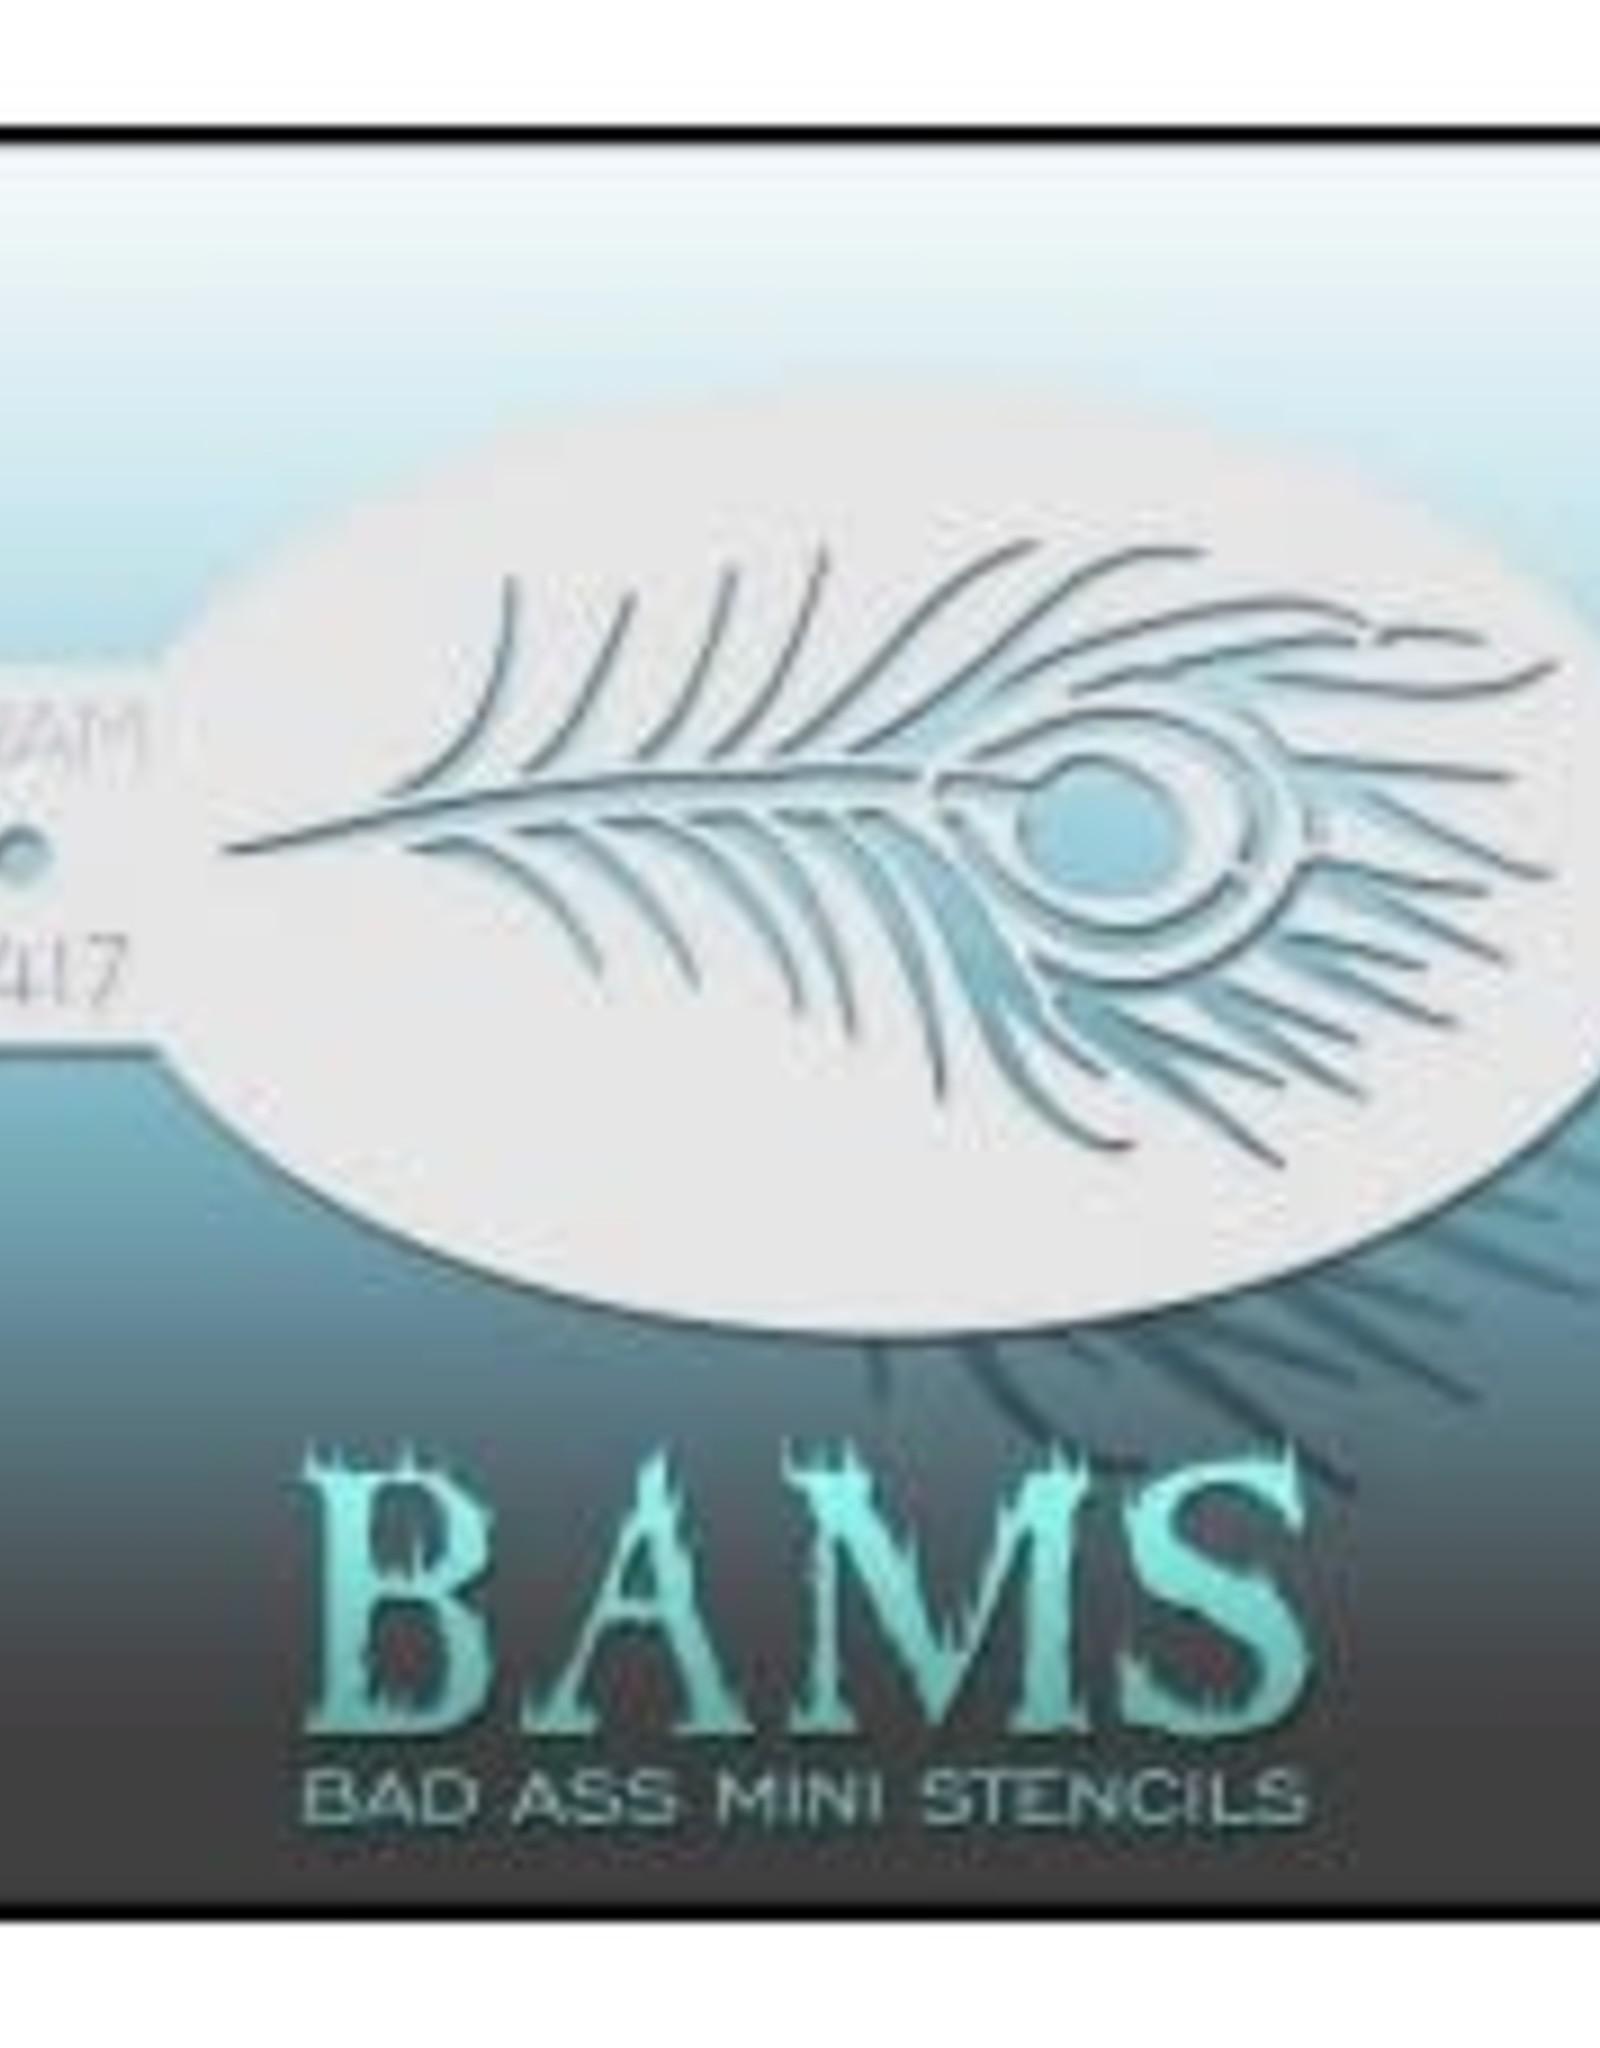 Bad Ass Stencils Bad Ass Mini Stencil - BAM1417